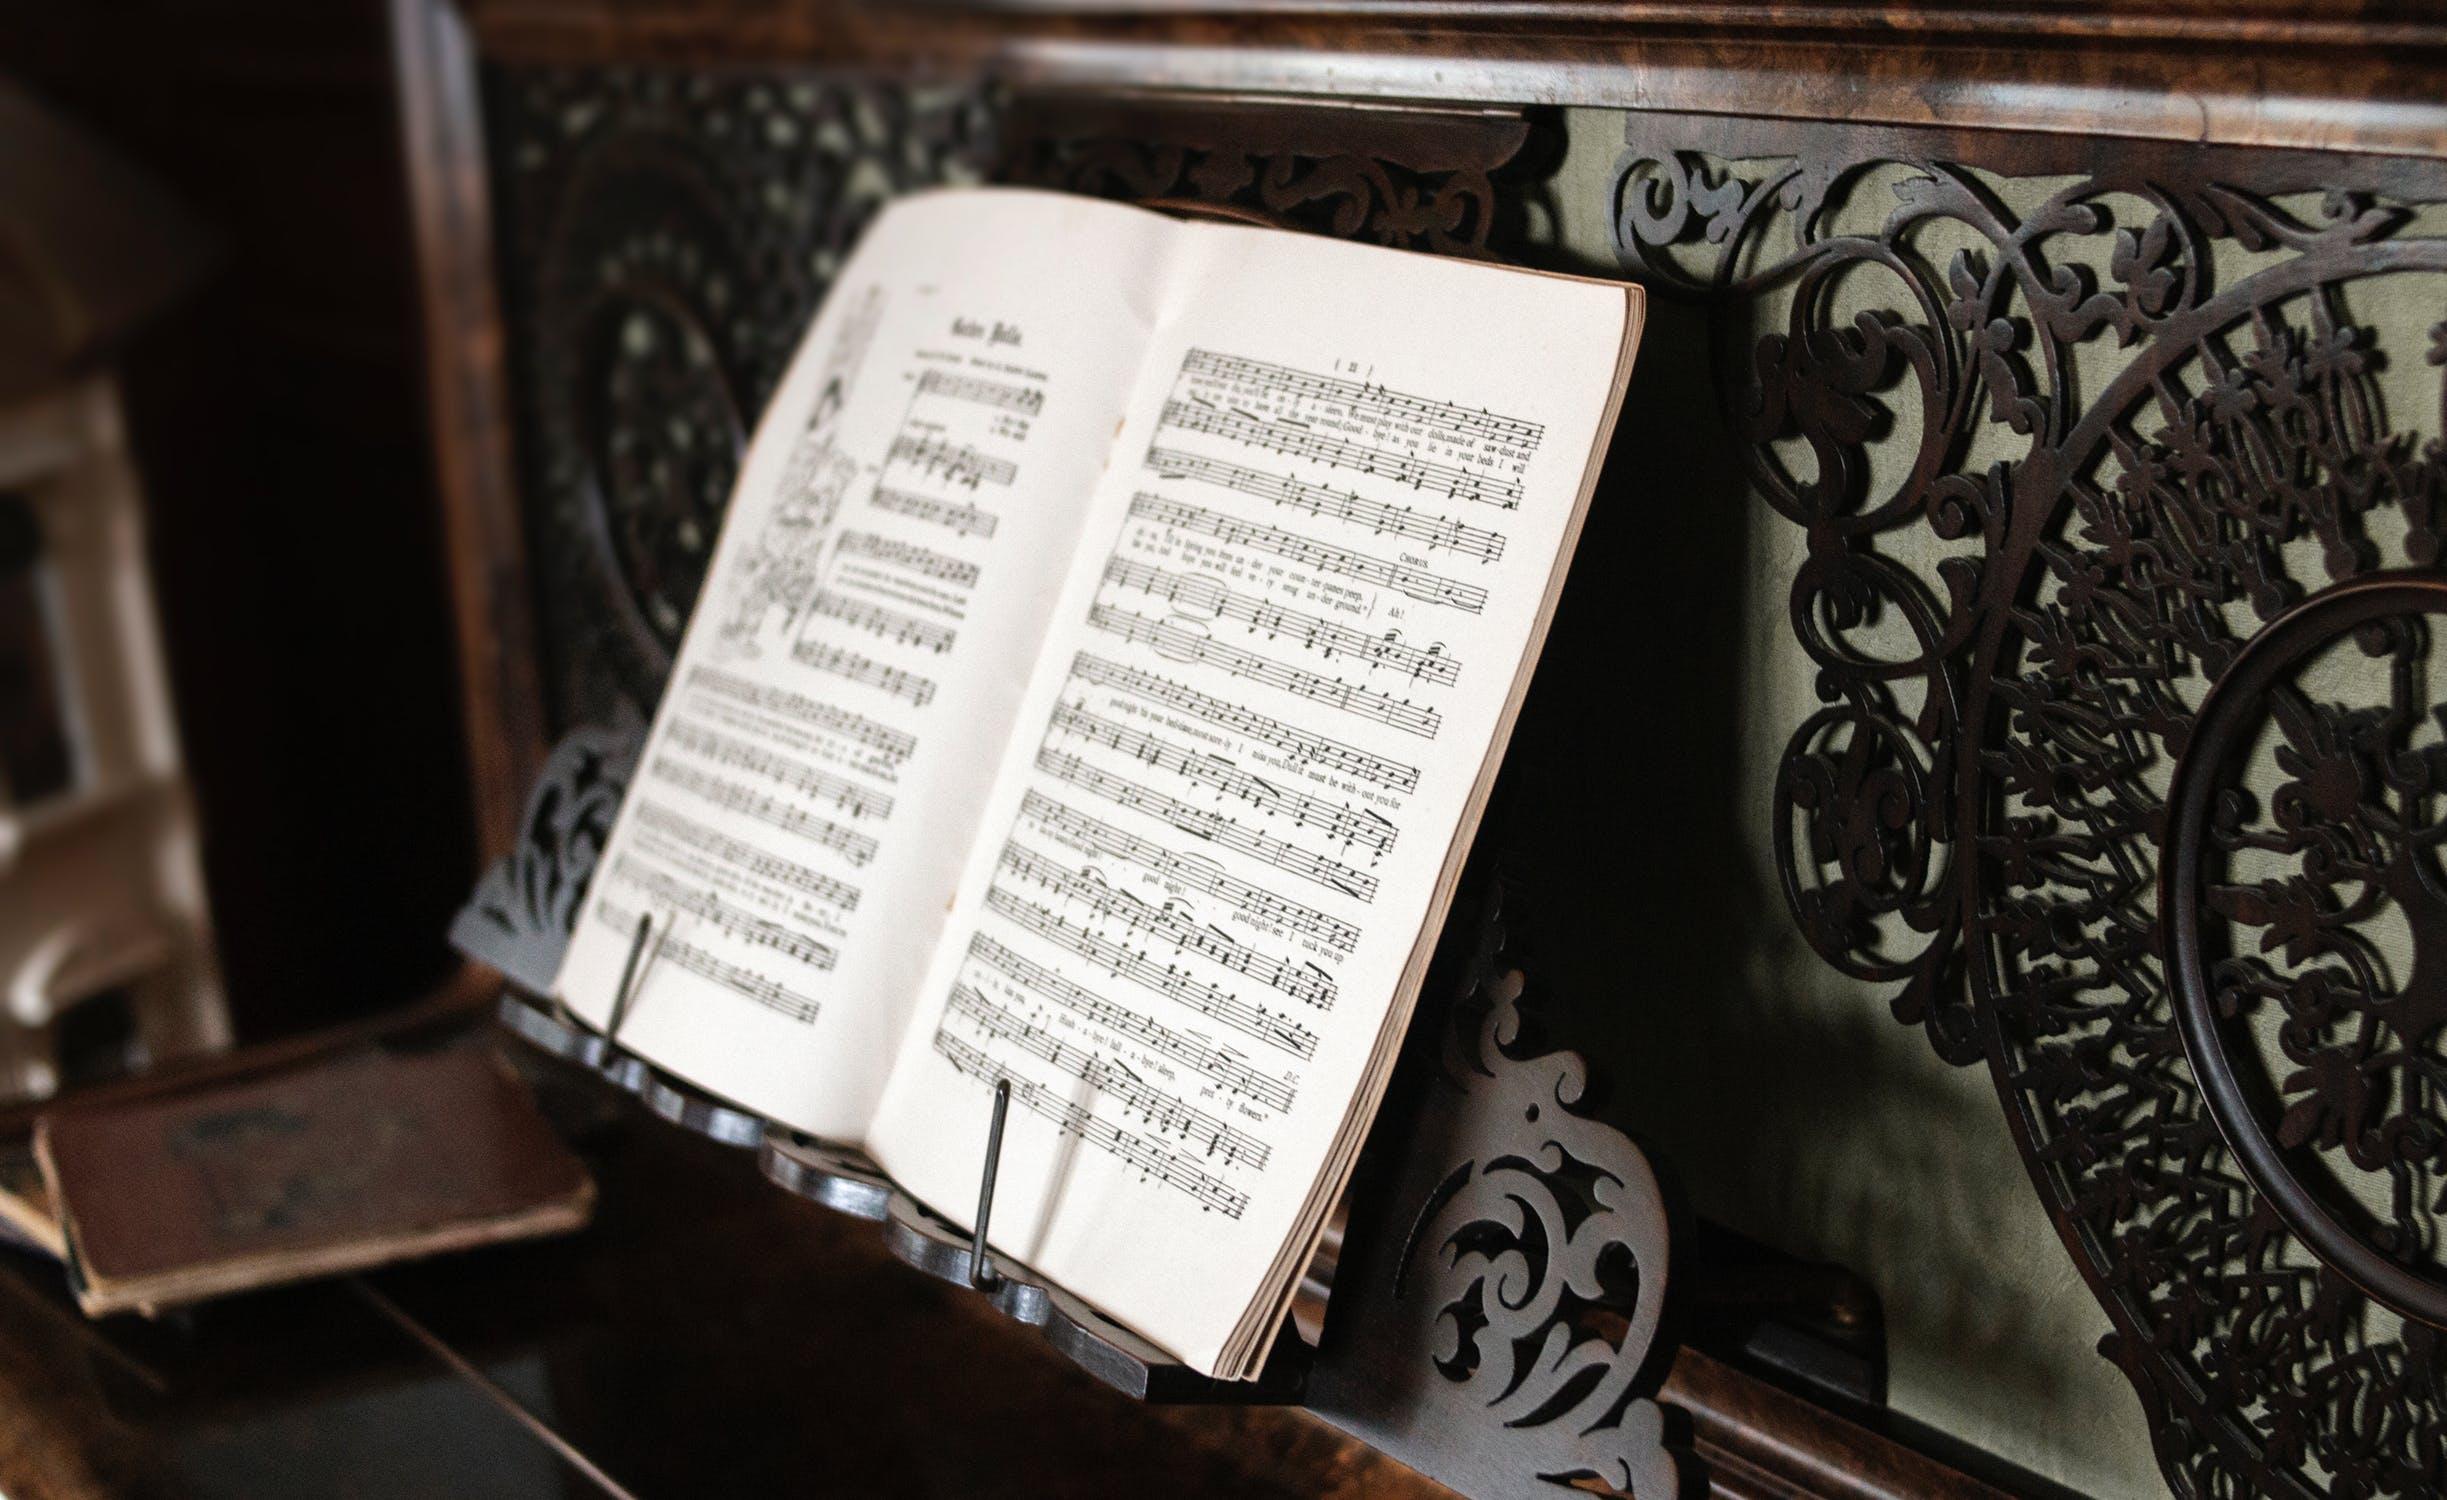 music concert love amicie de spoelberch